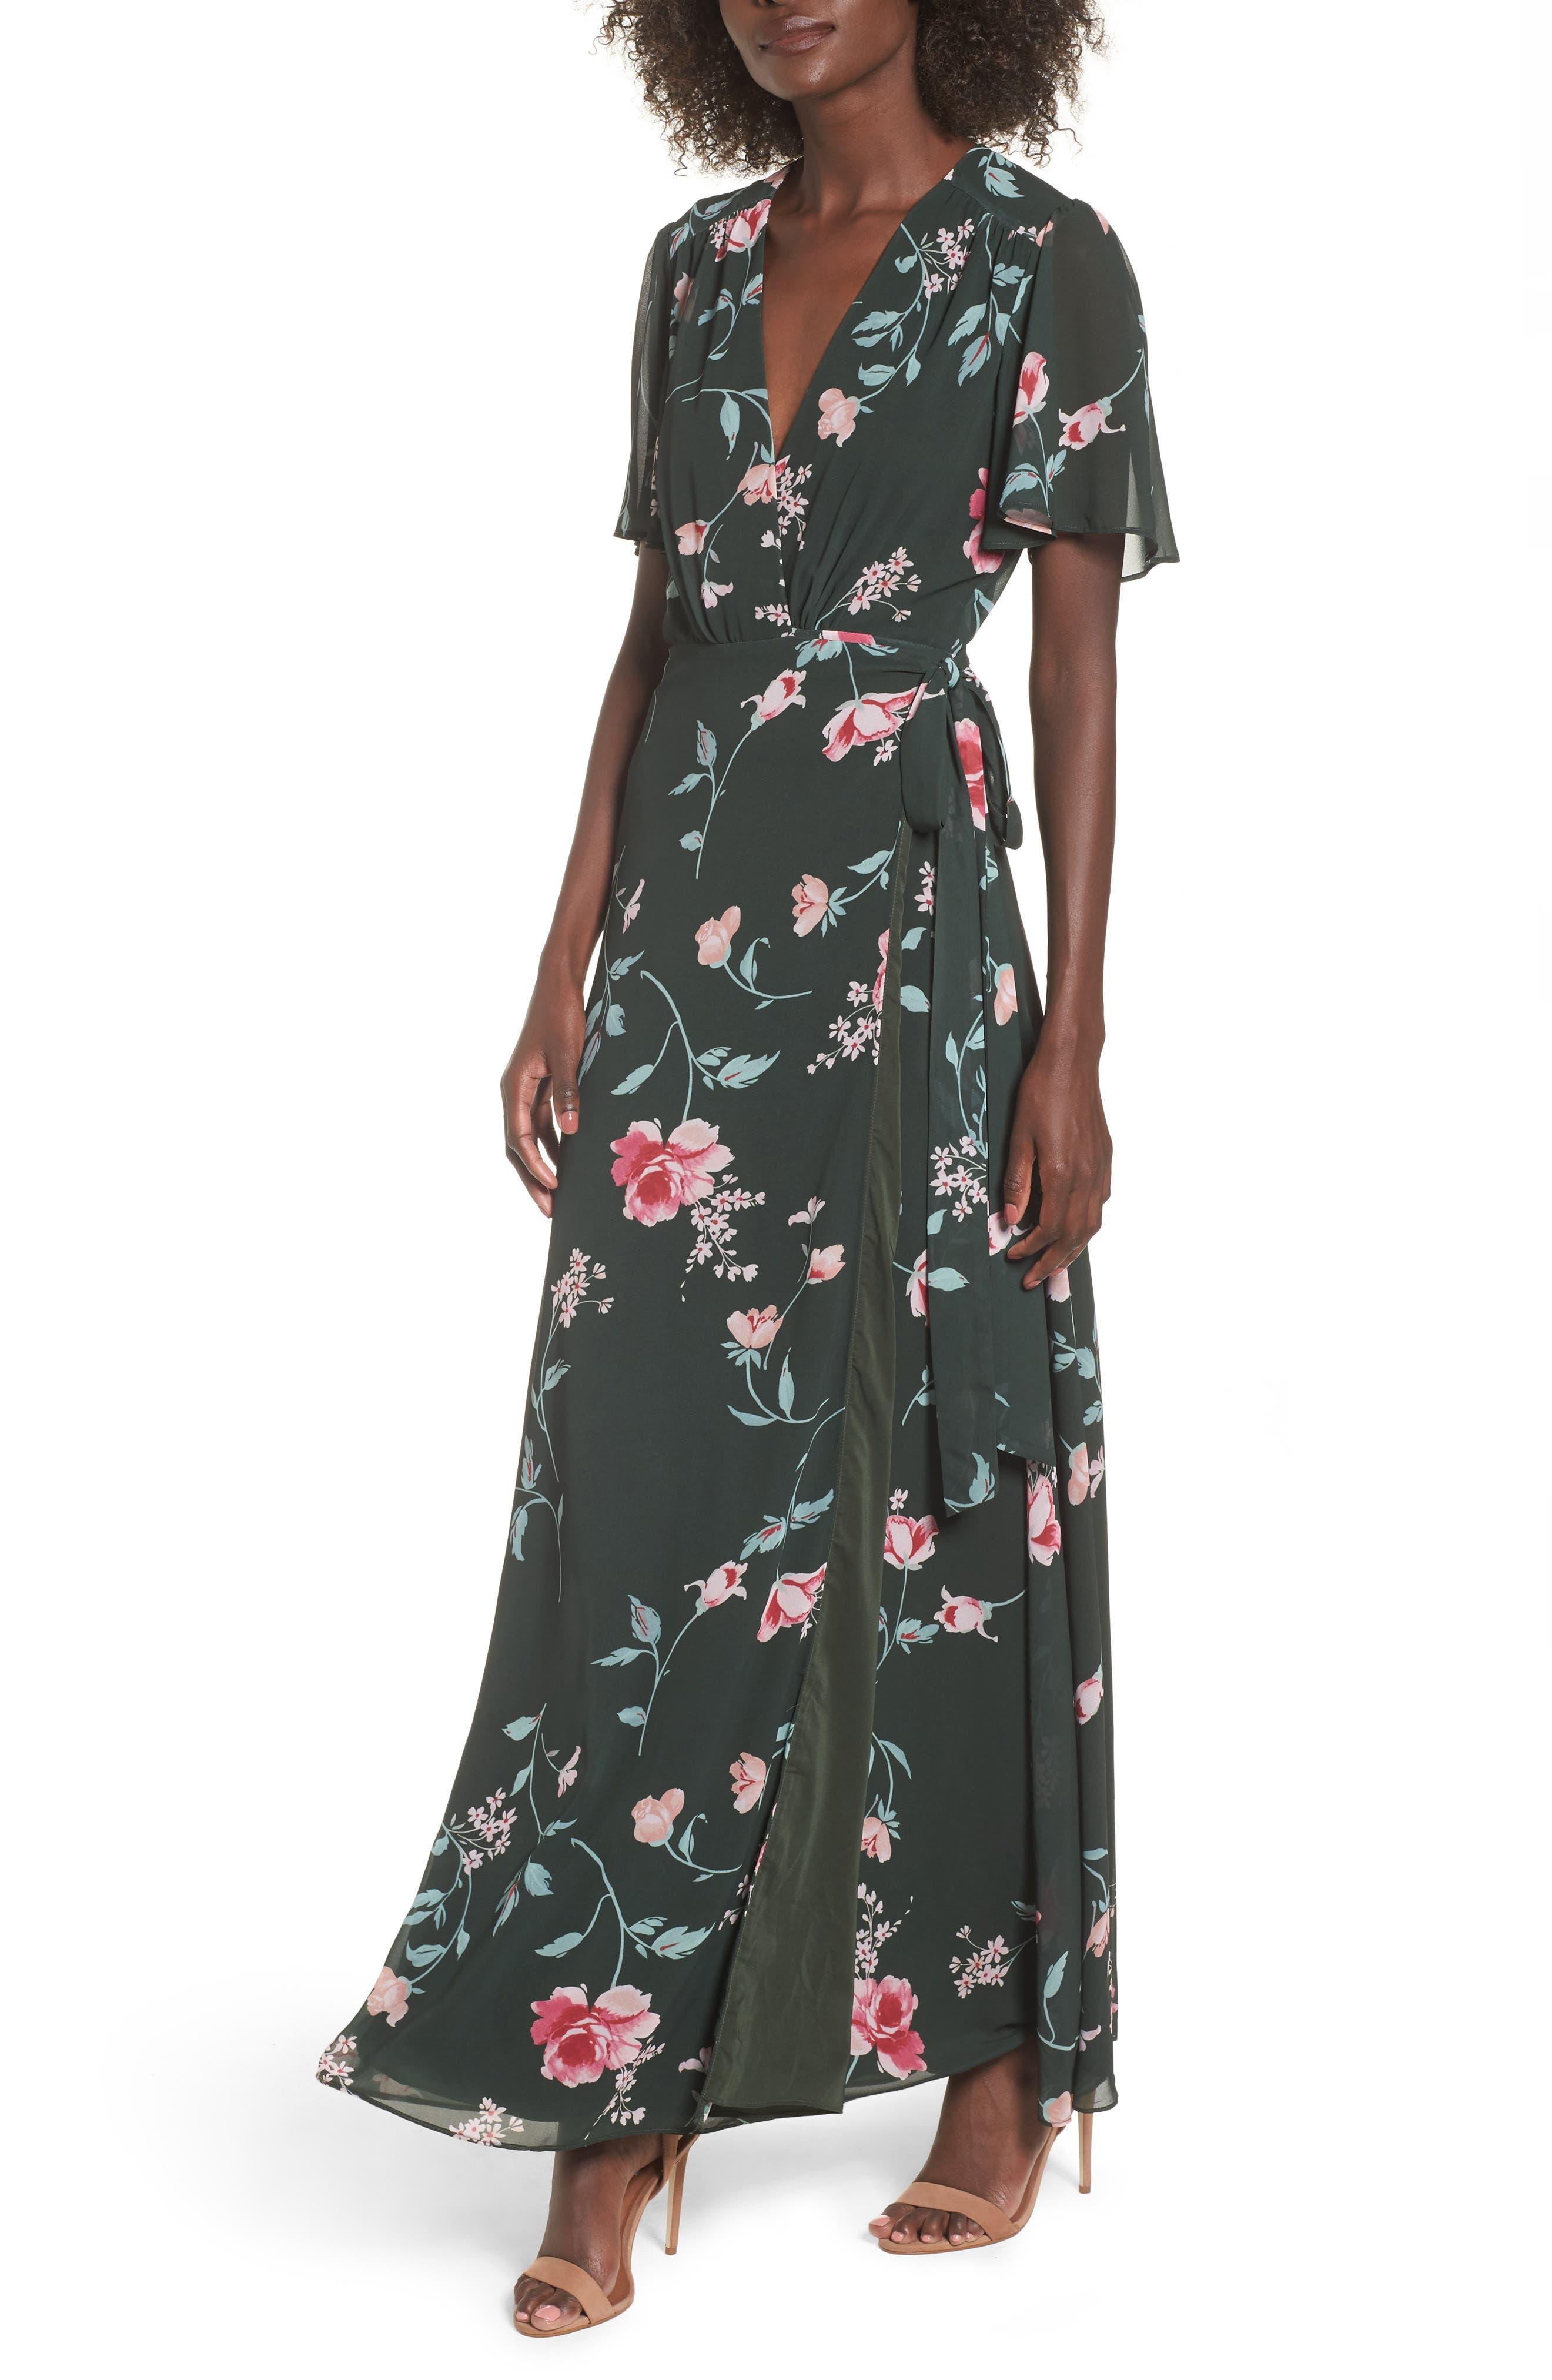 Plaza Kimono Maxi Dress,                             Main thumbnail 1, color,                             Evergreen Floral